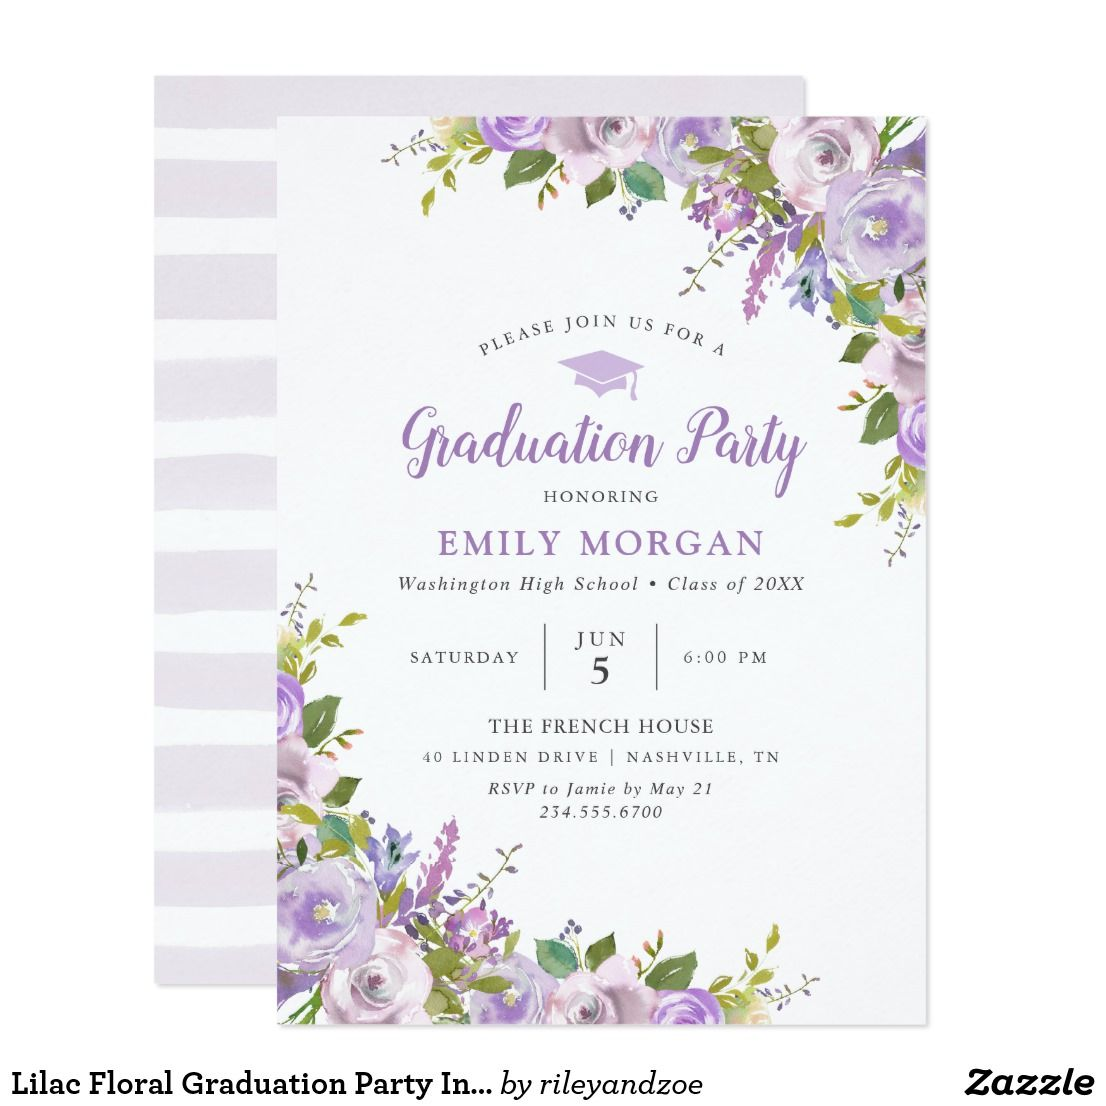 Lilac Floral Graduation Party Invitation